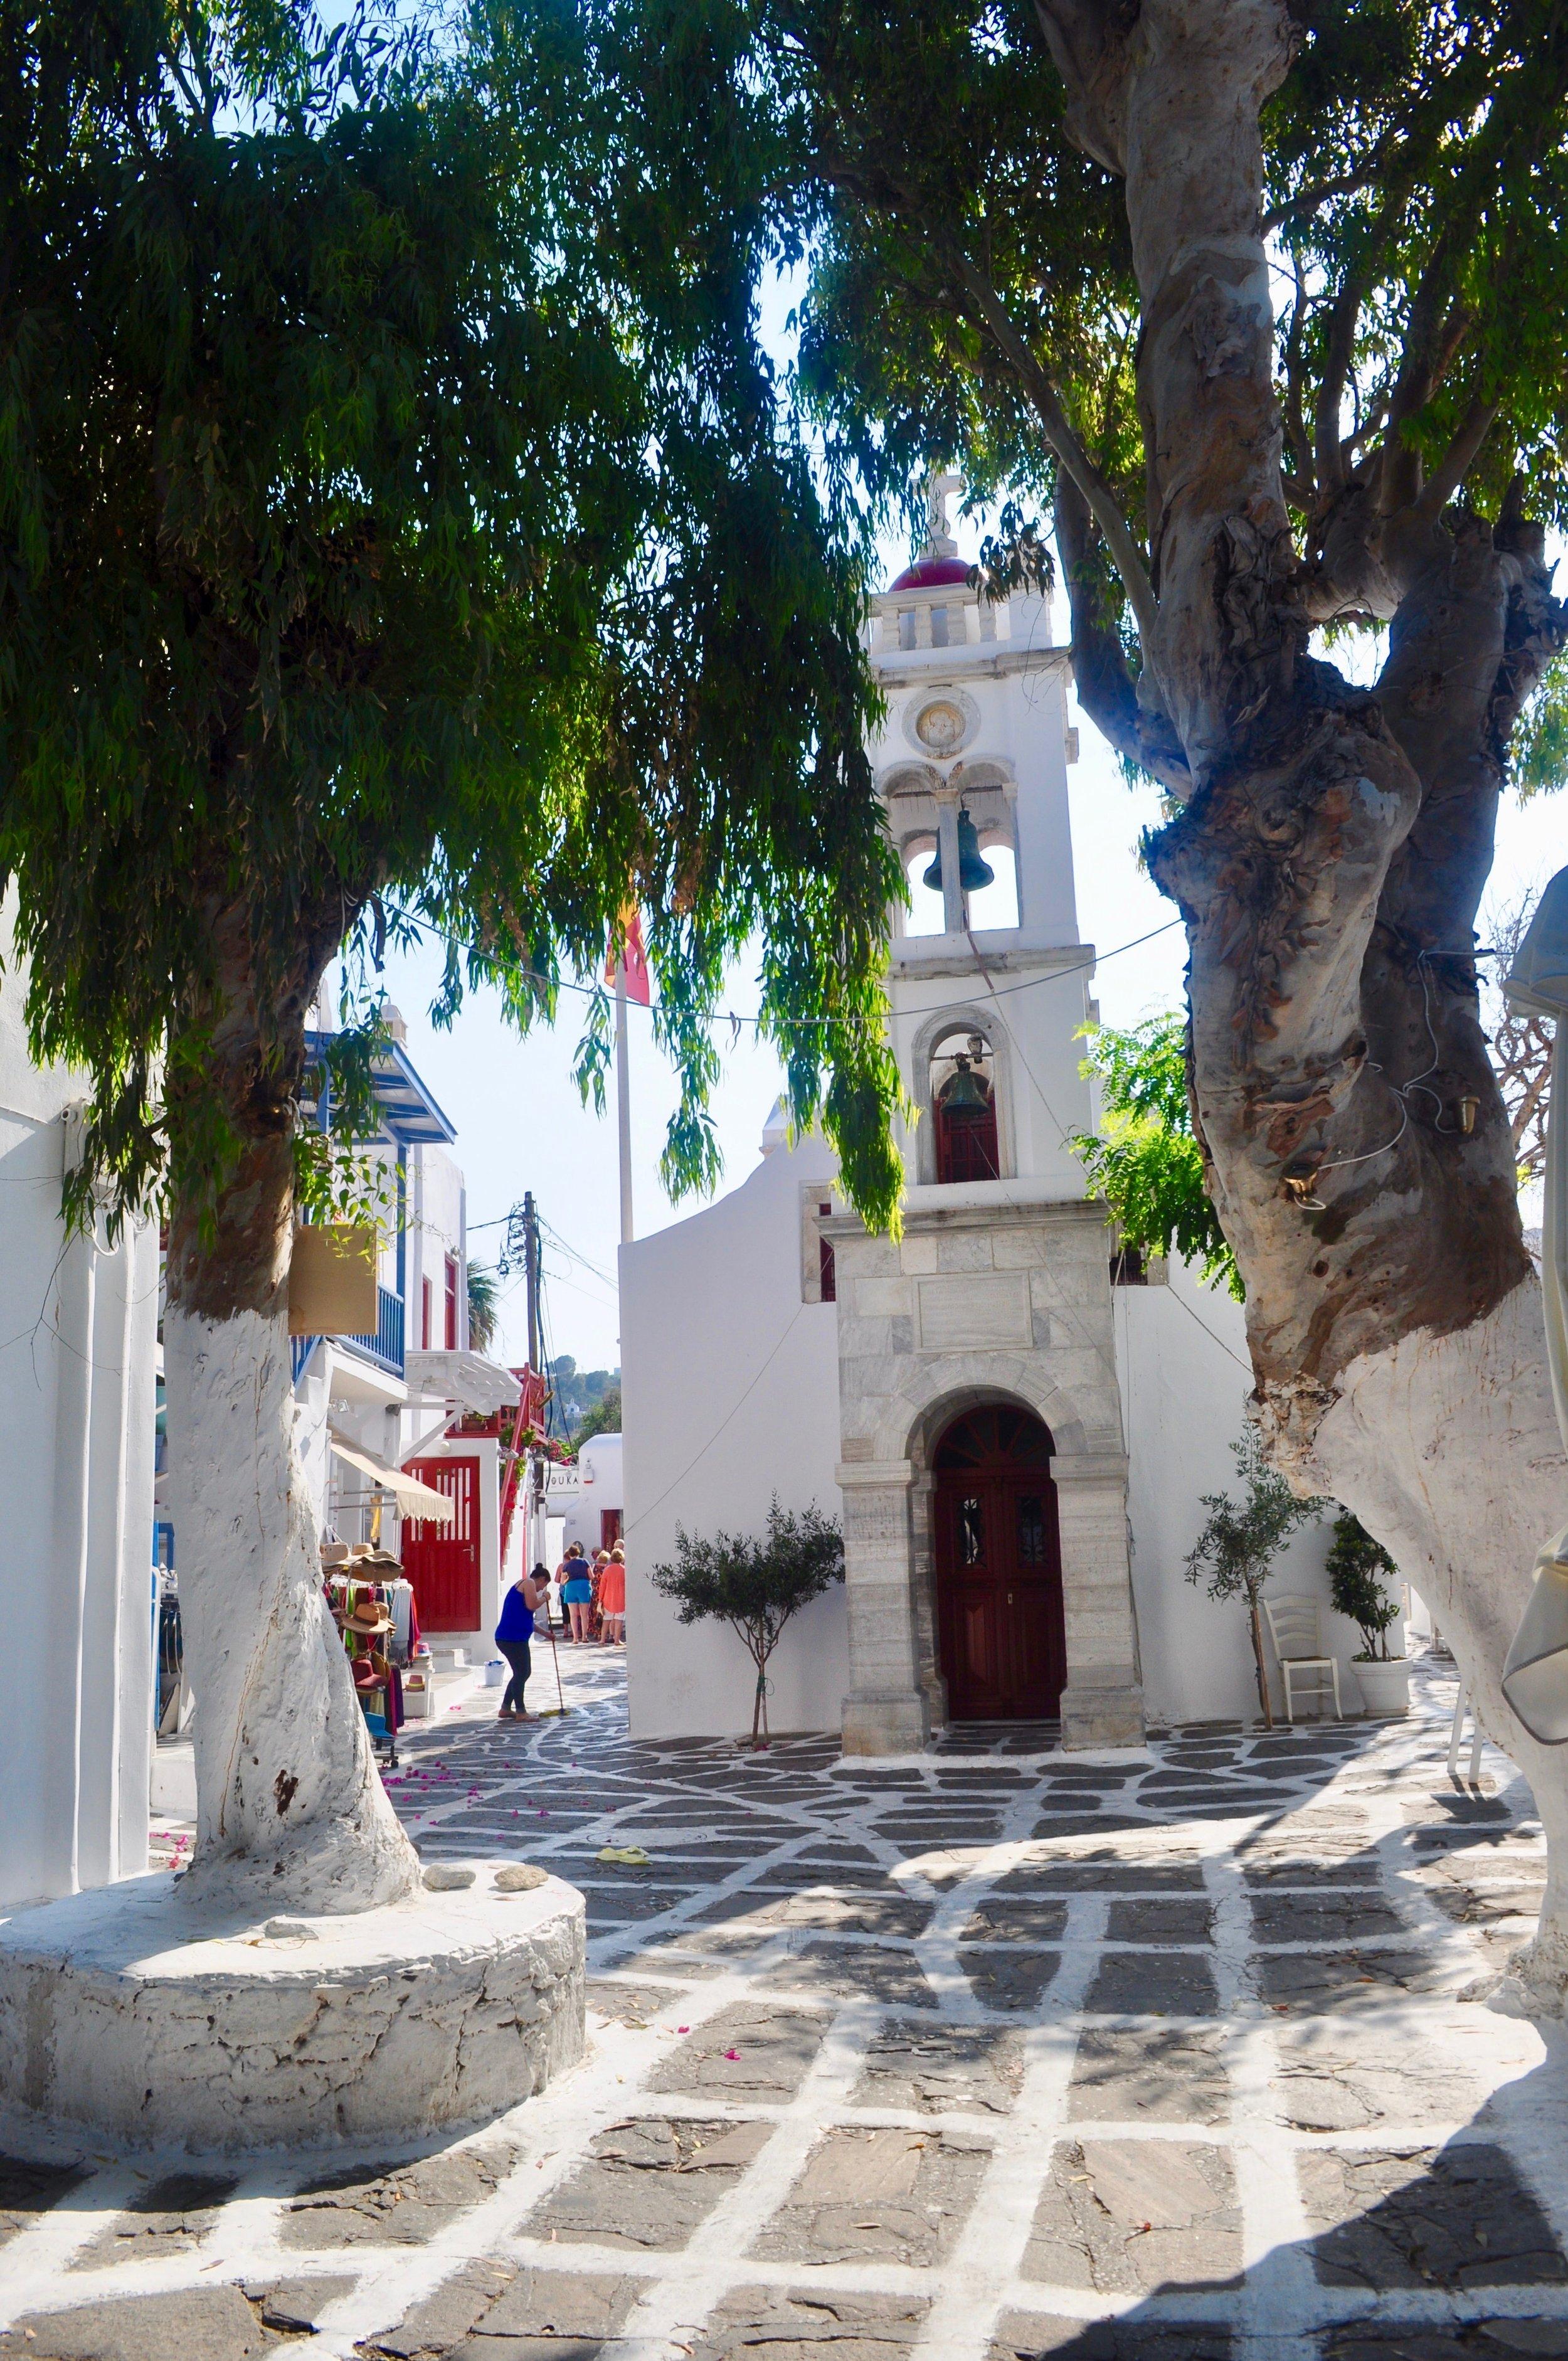 Half Day in the Stunning Mykonos Greece - A Happy Passport #mykonos #greece #travel